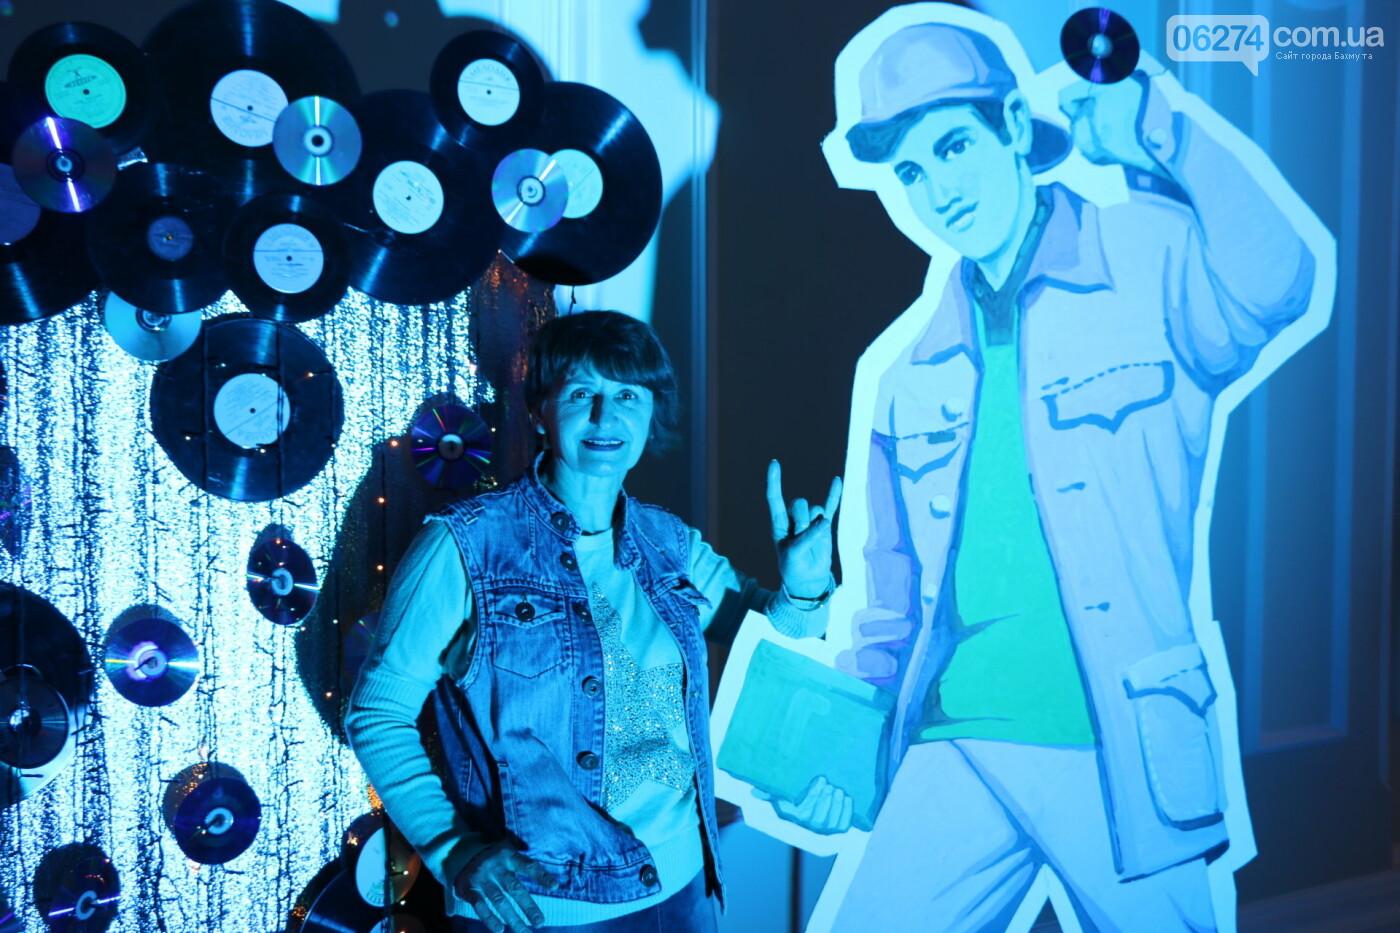 В Бахмуте провели Disco House Party (ФОТООТЧЕТ), фото-4